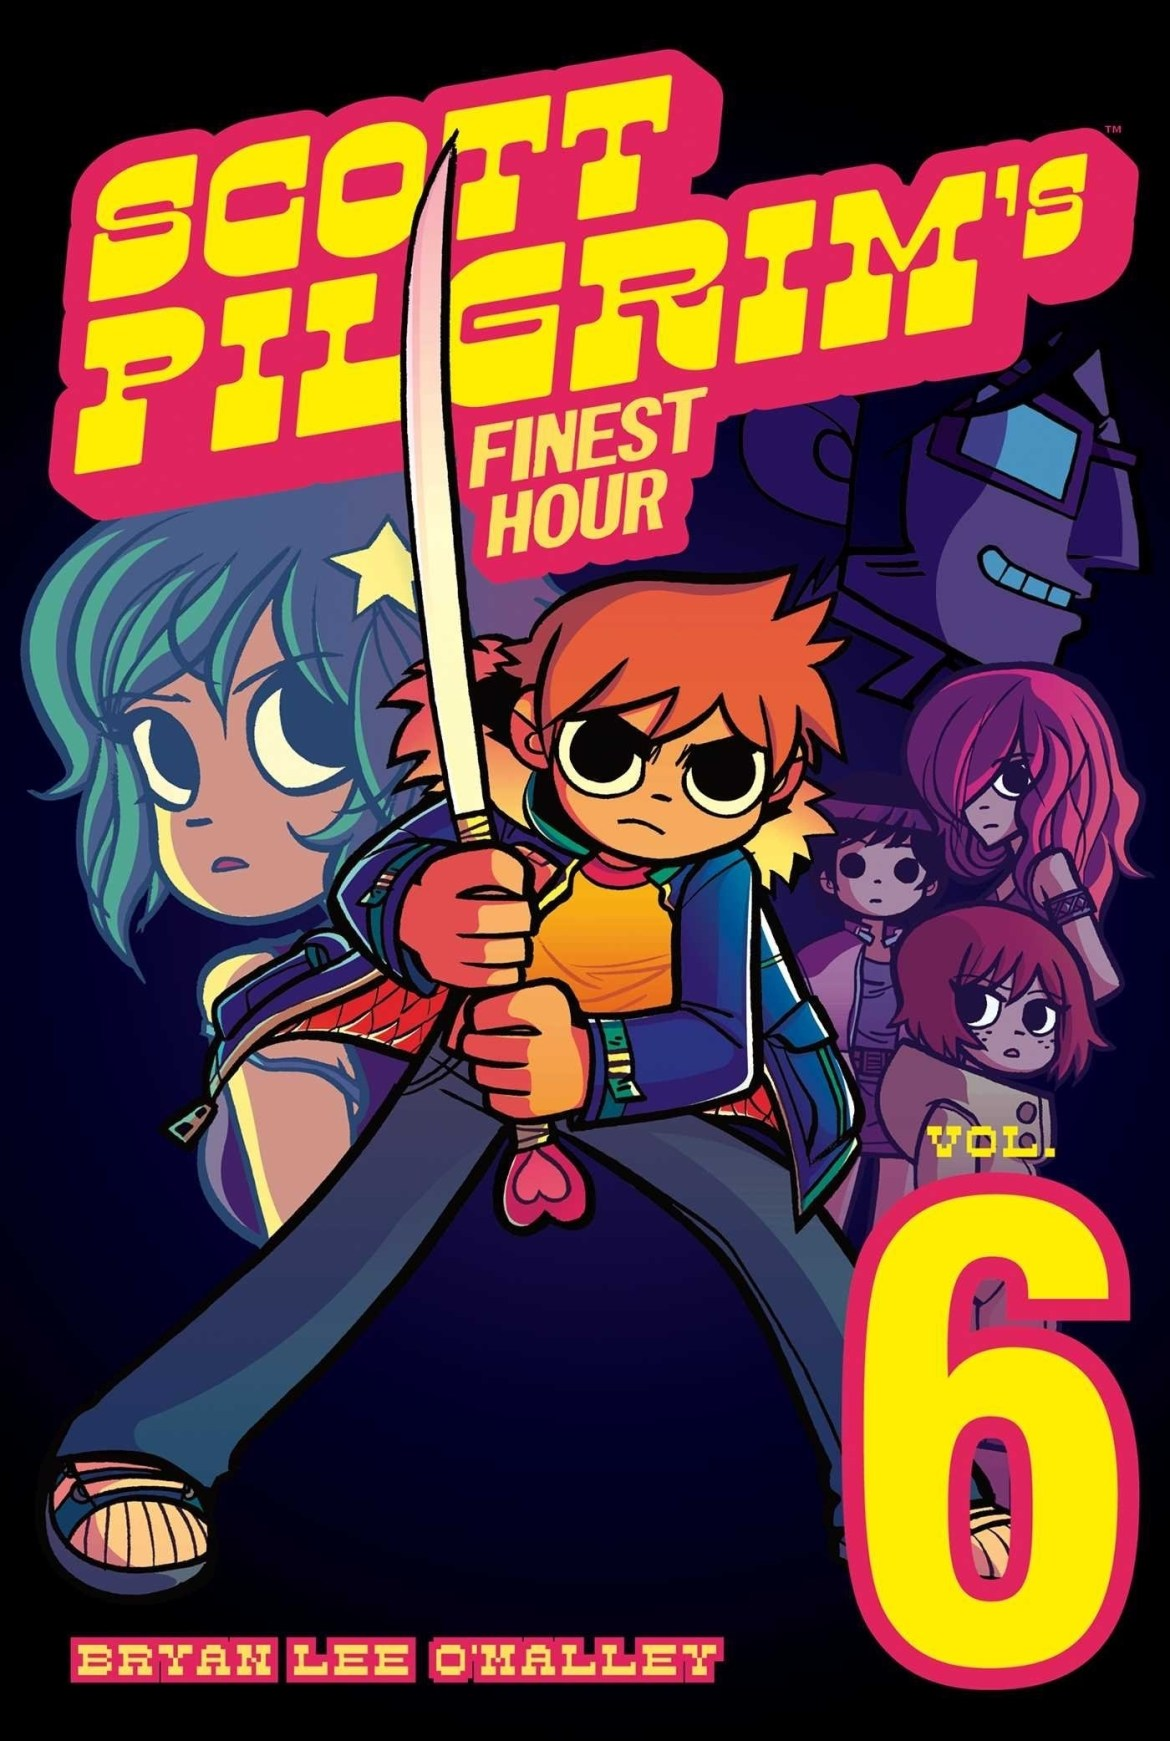 cover of Scott Pilgrim's Finest Hour